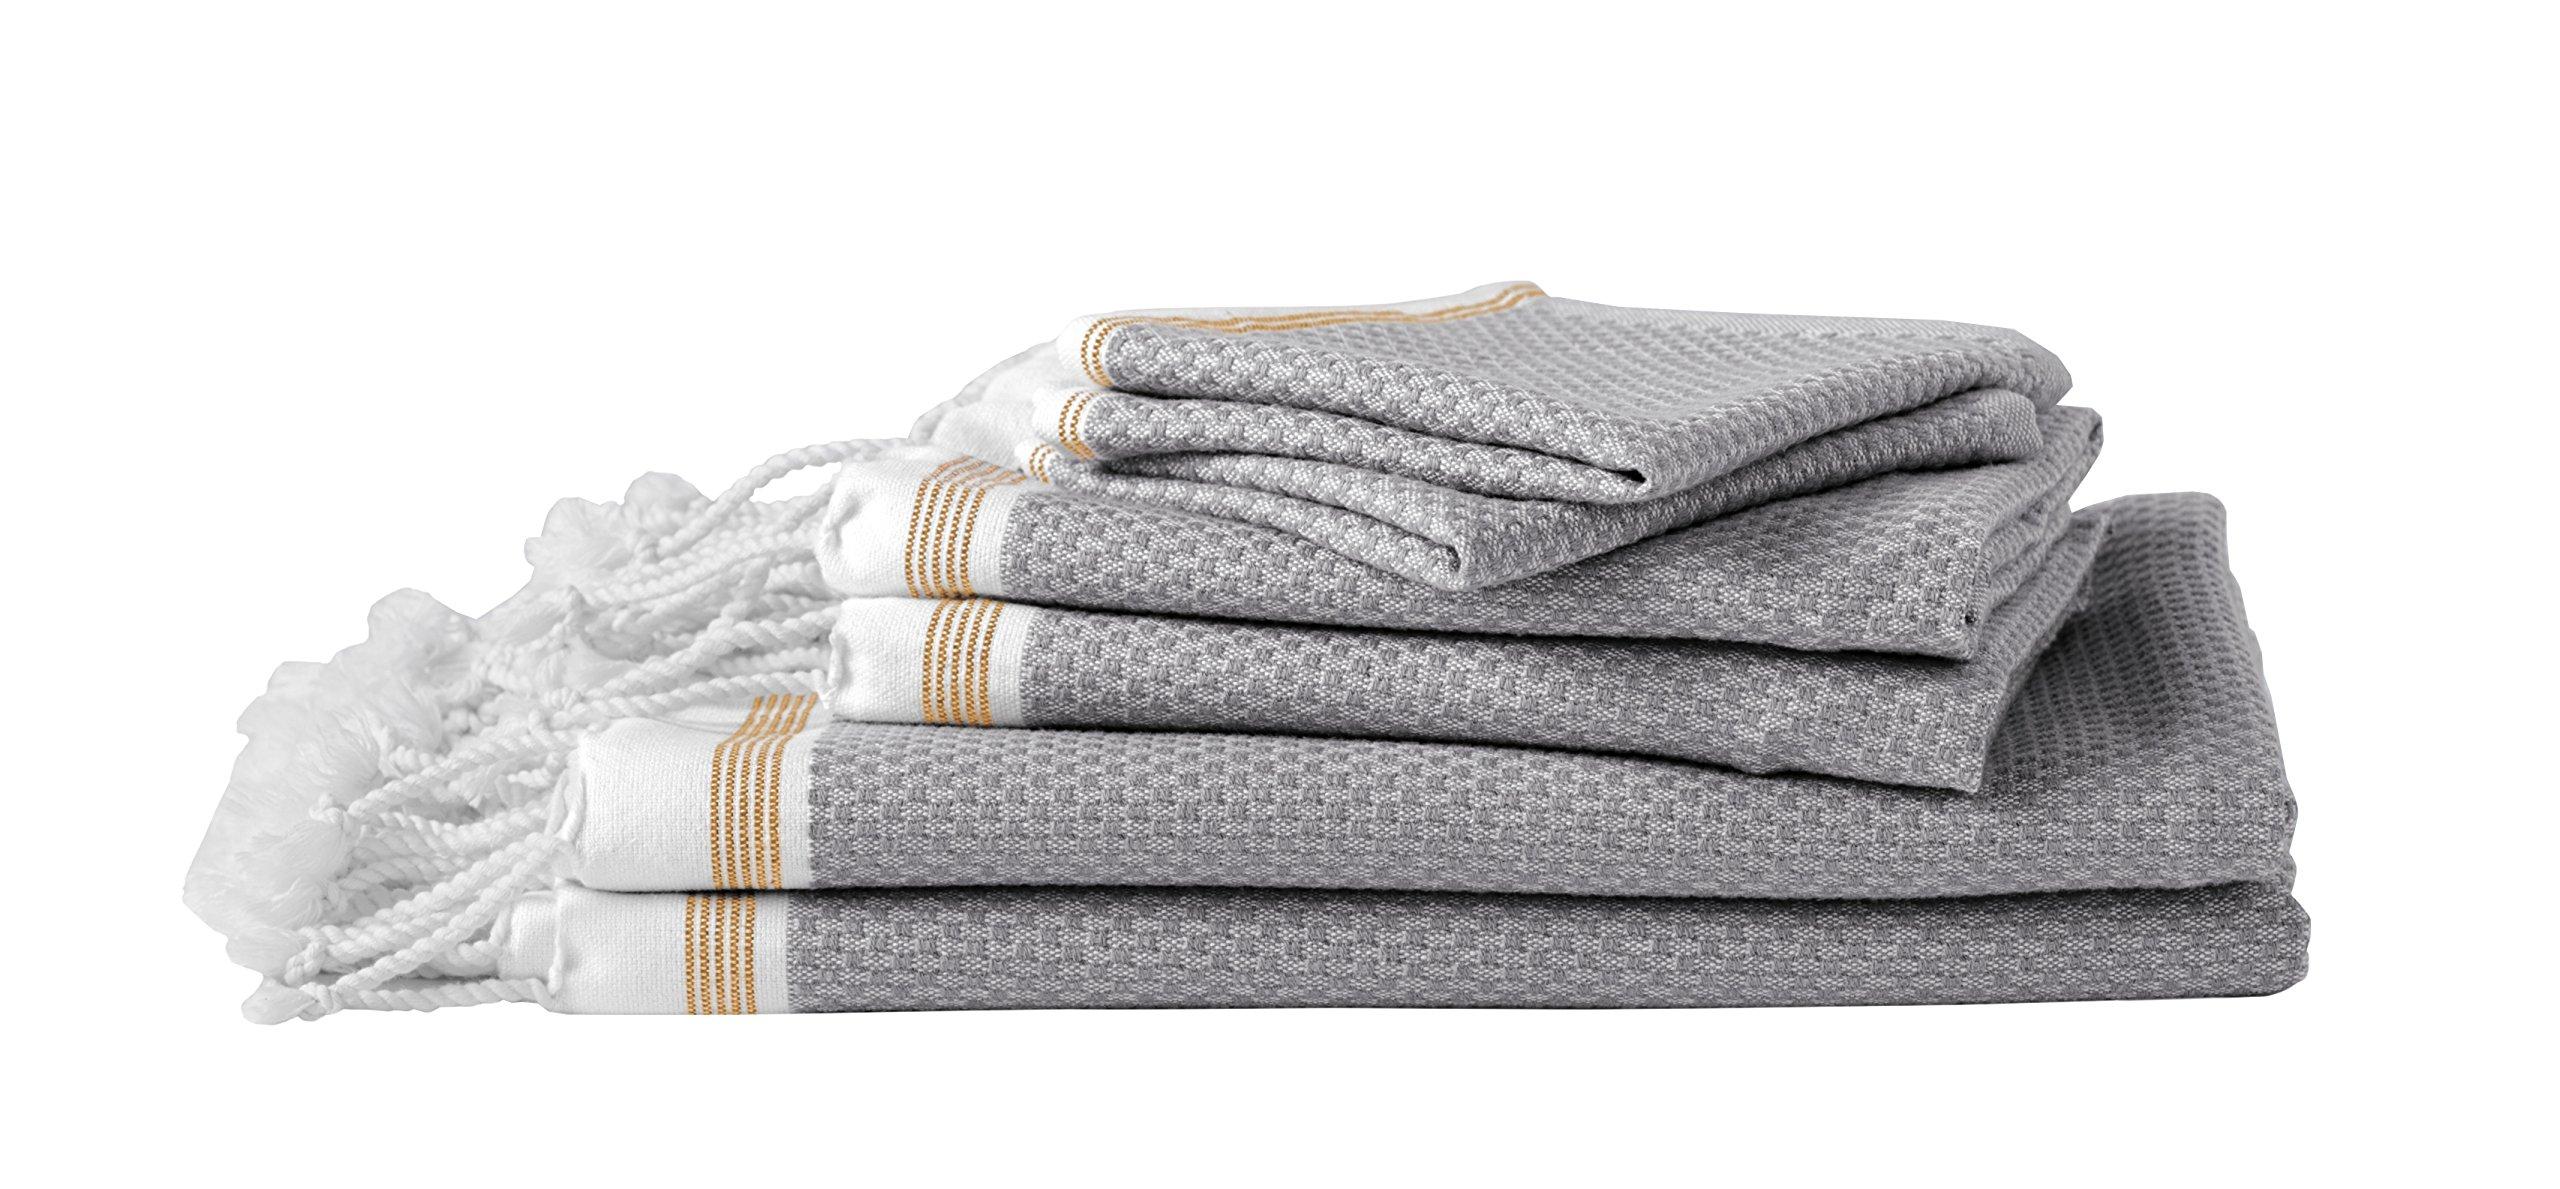 Coyuchi Mediterranean 6pc Towel Set, BT, GT, WC, Deep Pewter w/Tangerine Stripe